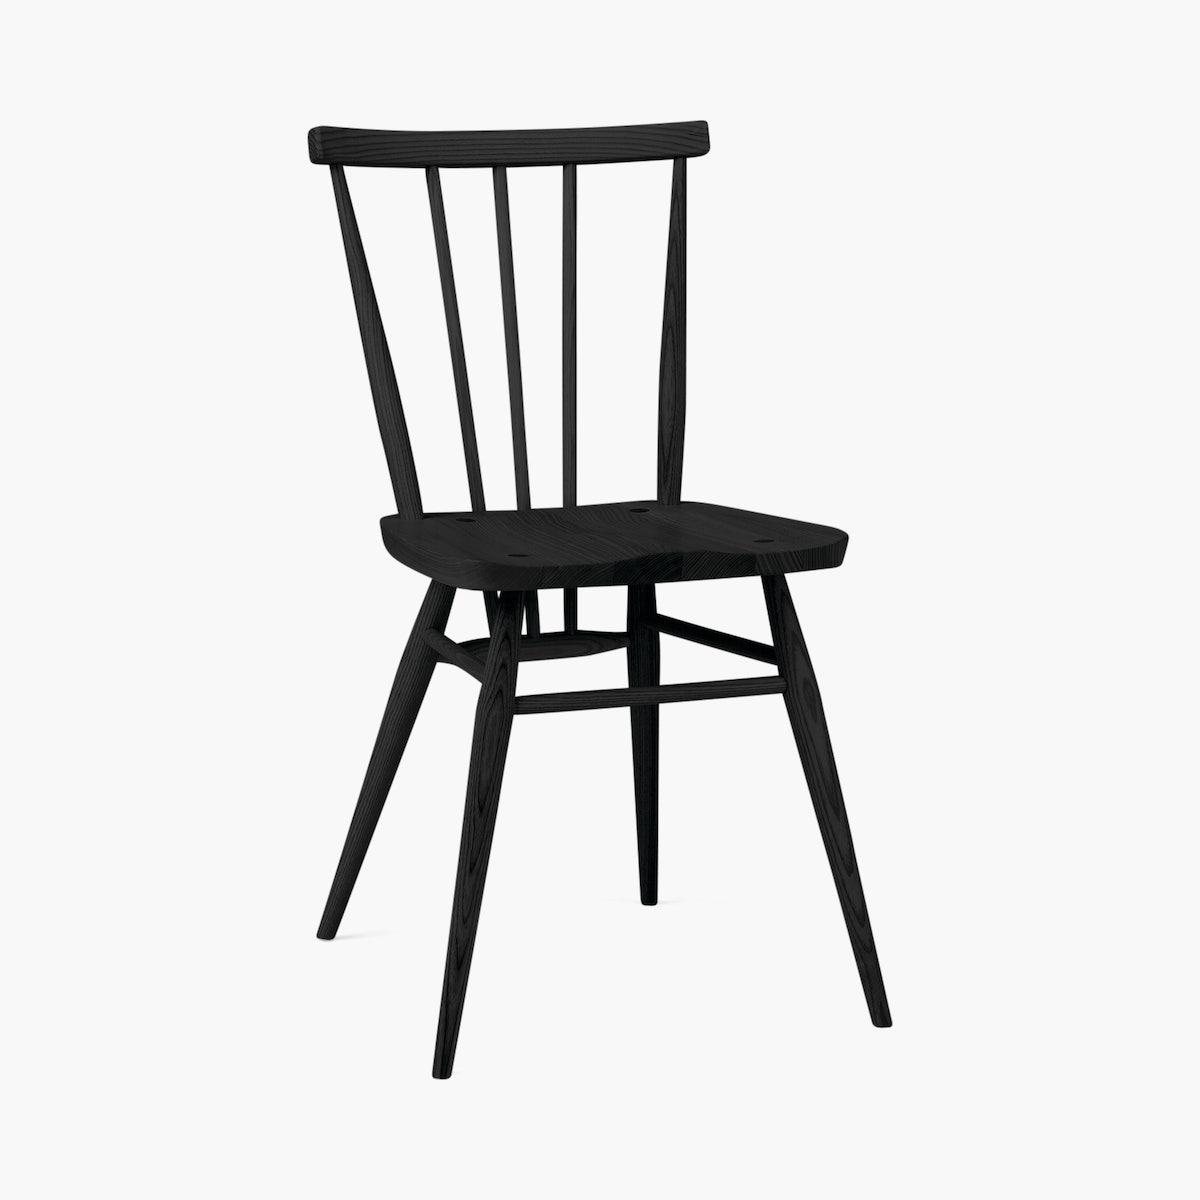 Originals All Purpose Chair